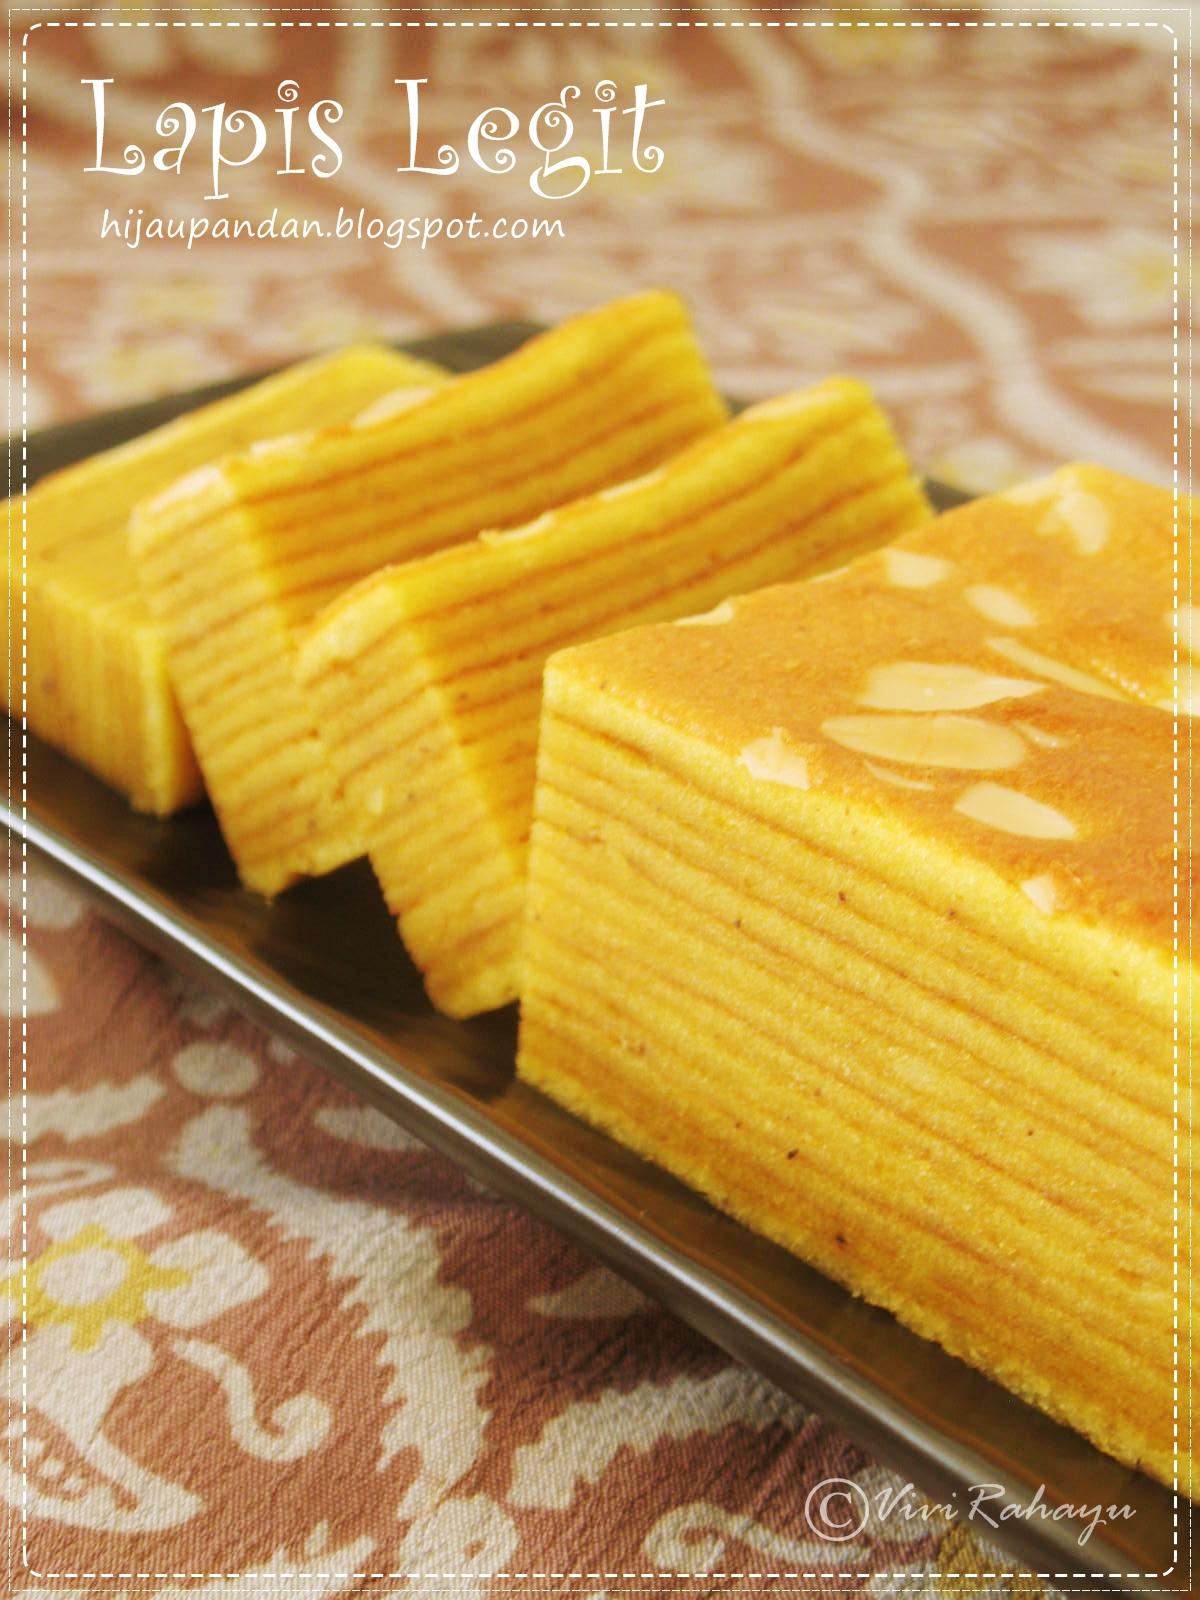 Lapis legit sumber kue kue indonesia yasaboga 300 gr mentega